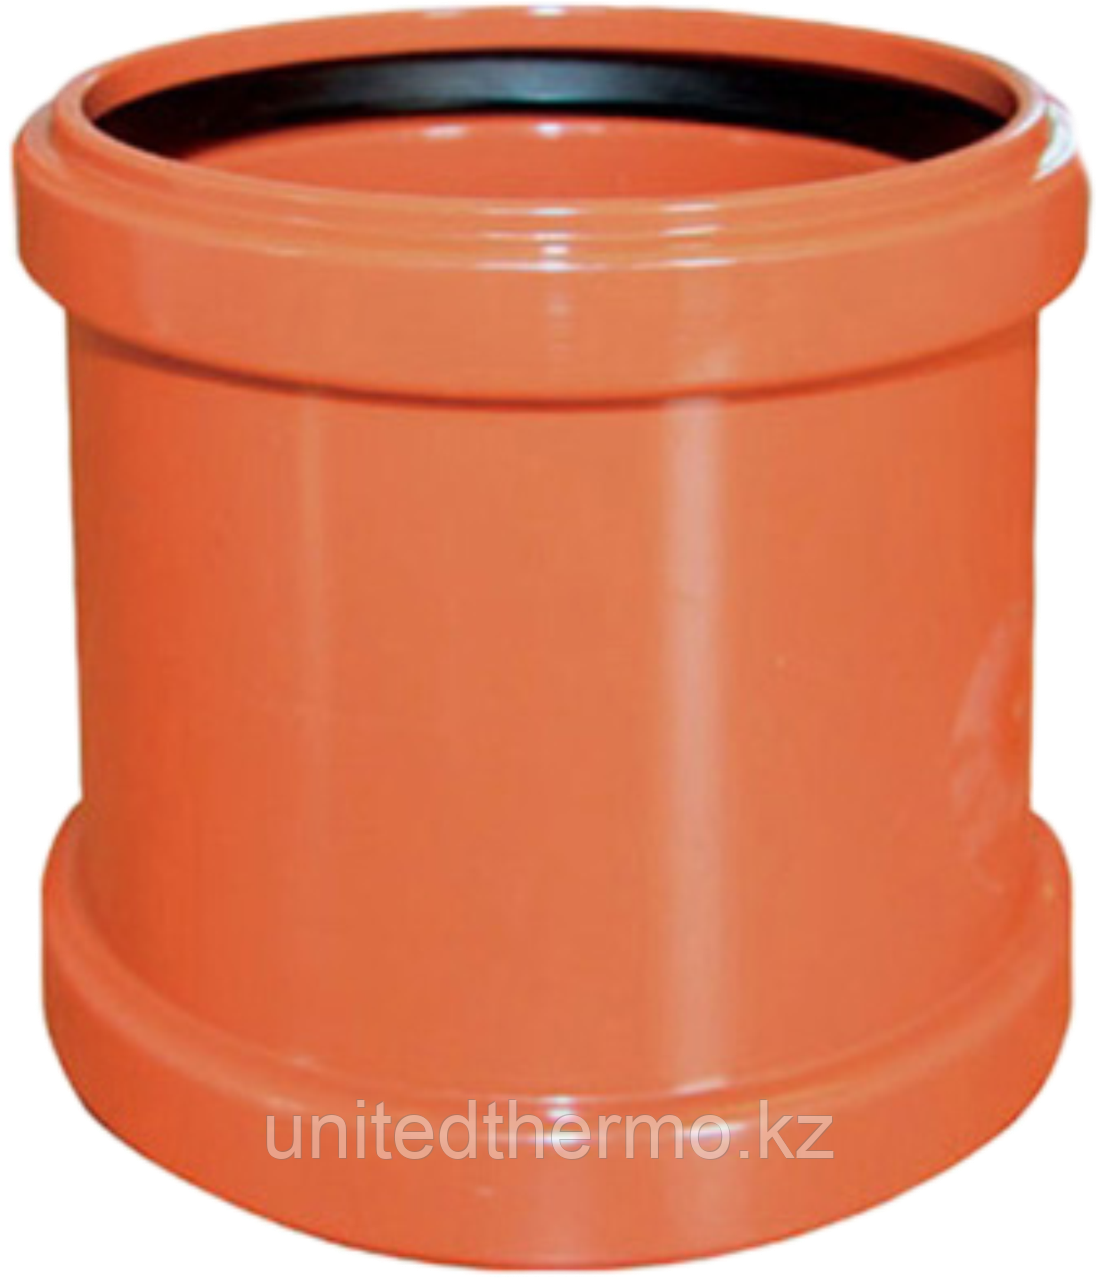 Муфта ПП д110 (3.4мм) оранжевая